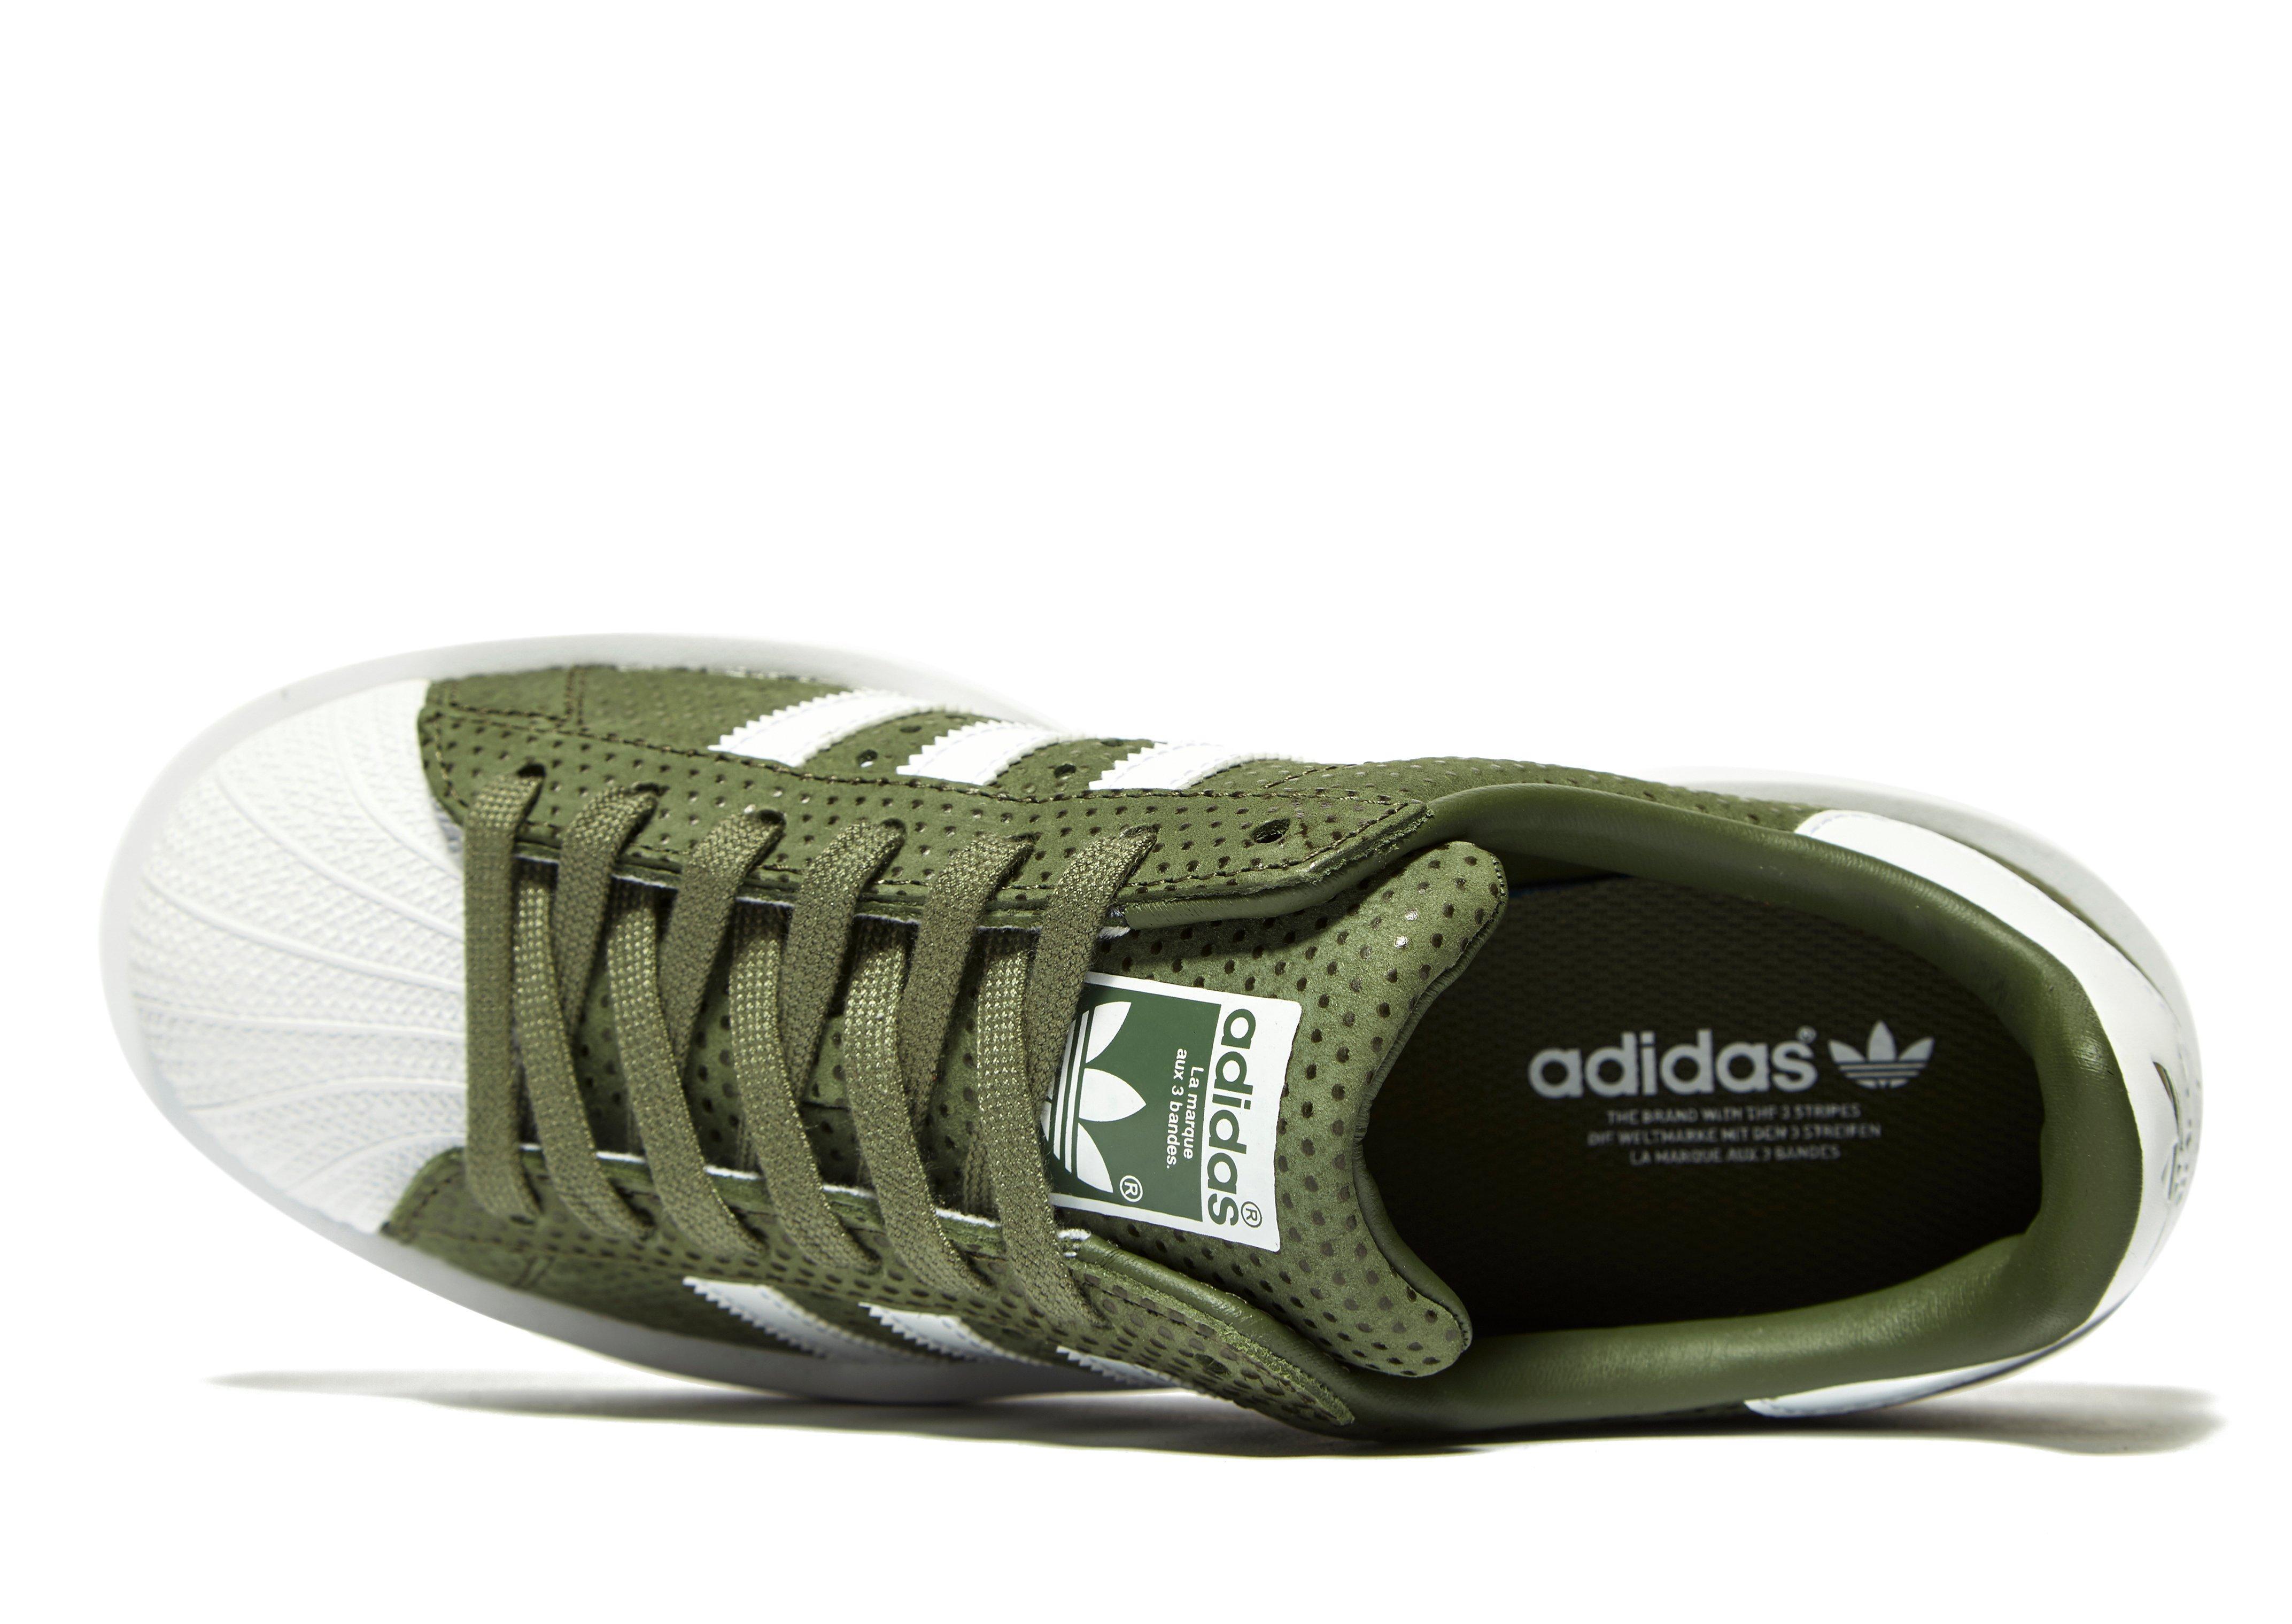 on sale d5396 91255 new zealand adidas superstars khaki 88a32 e4e7f